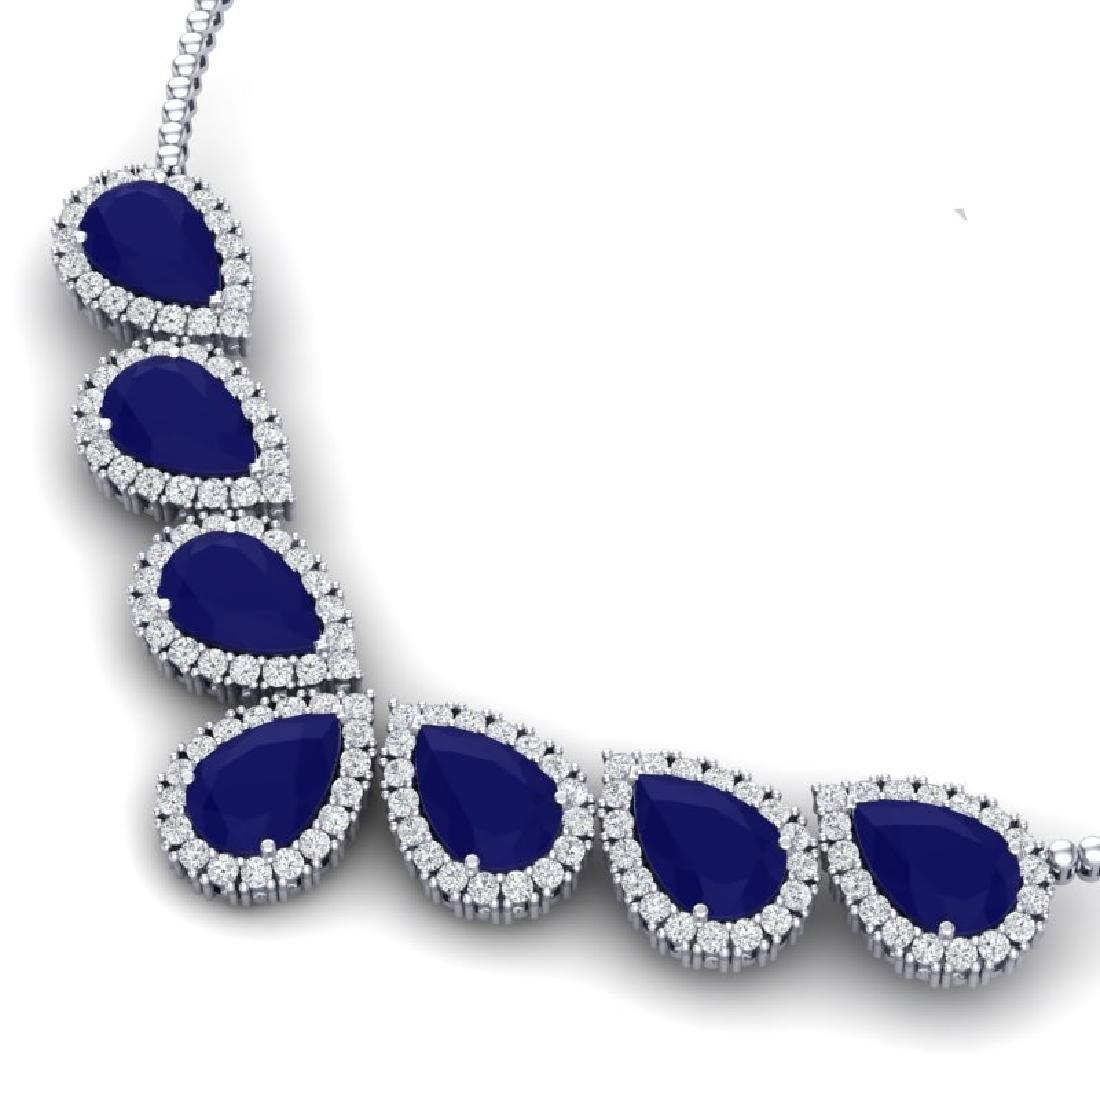 34.72 CTW Royalty Sapphire & VS Diamond Necklace 18K - 2